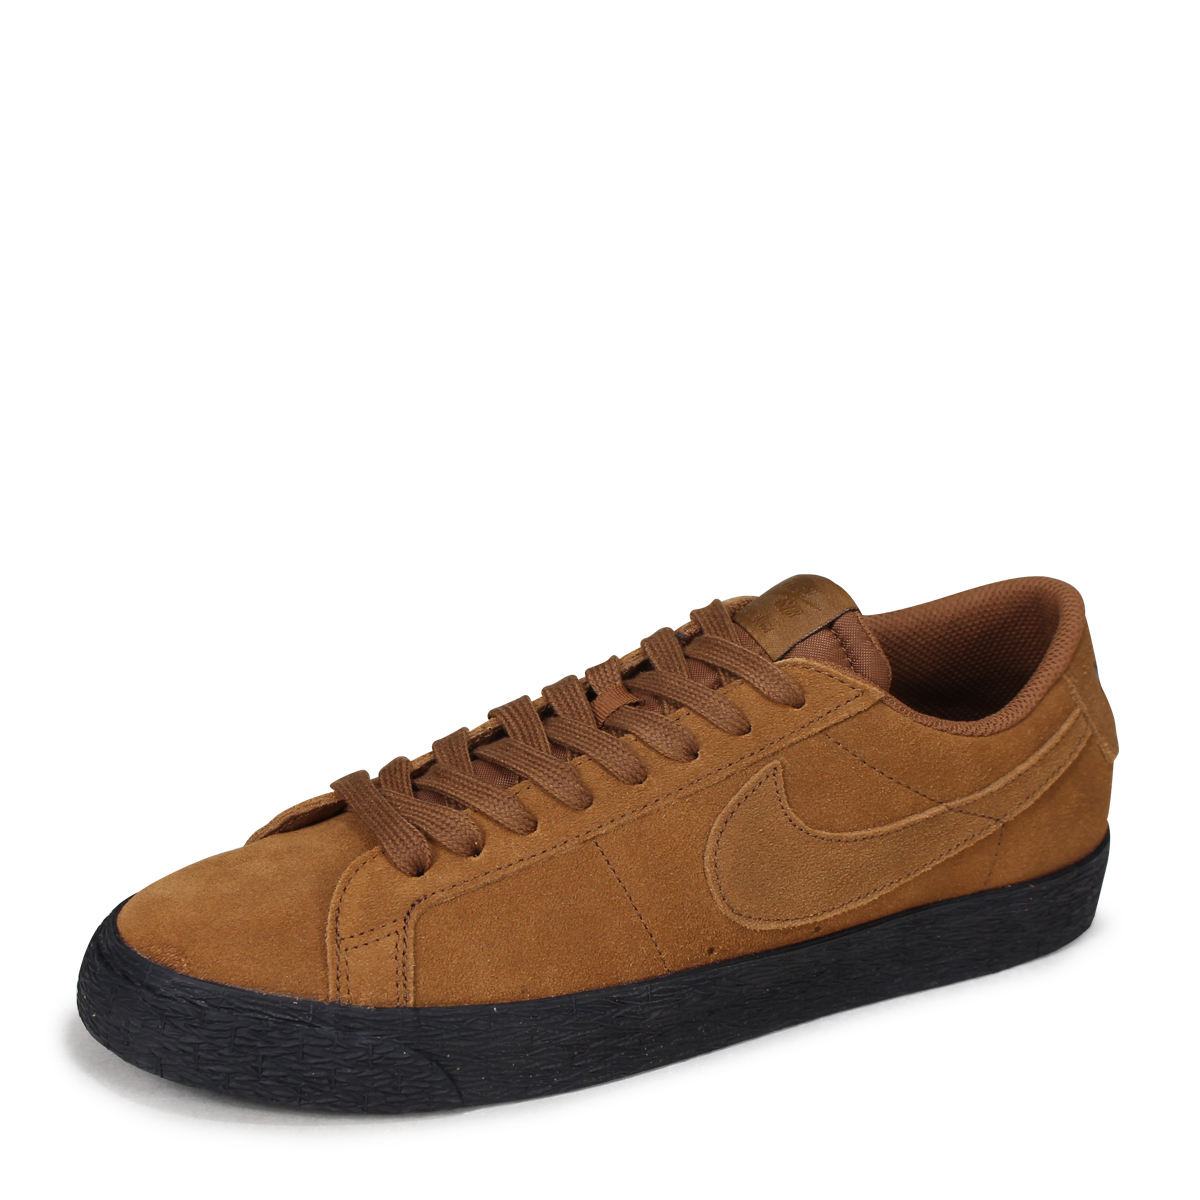 finest selection a84d6 211d5 NIKE SB ZOOM BLAZER LOW Nike blazer low sneakers men 864,347-200 brown  [7/13 Shinnyu load] [187]